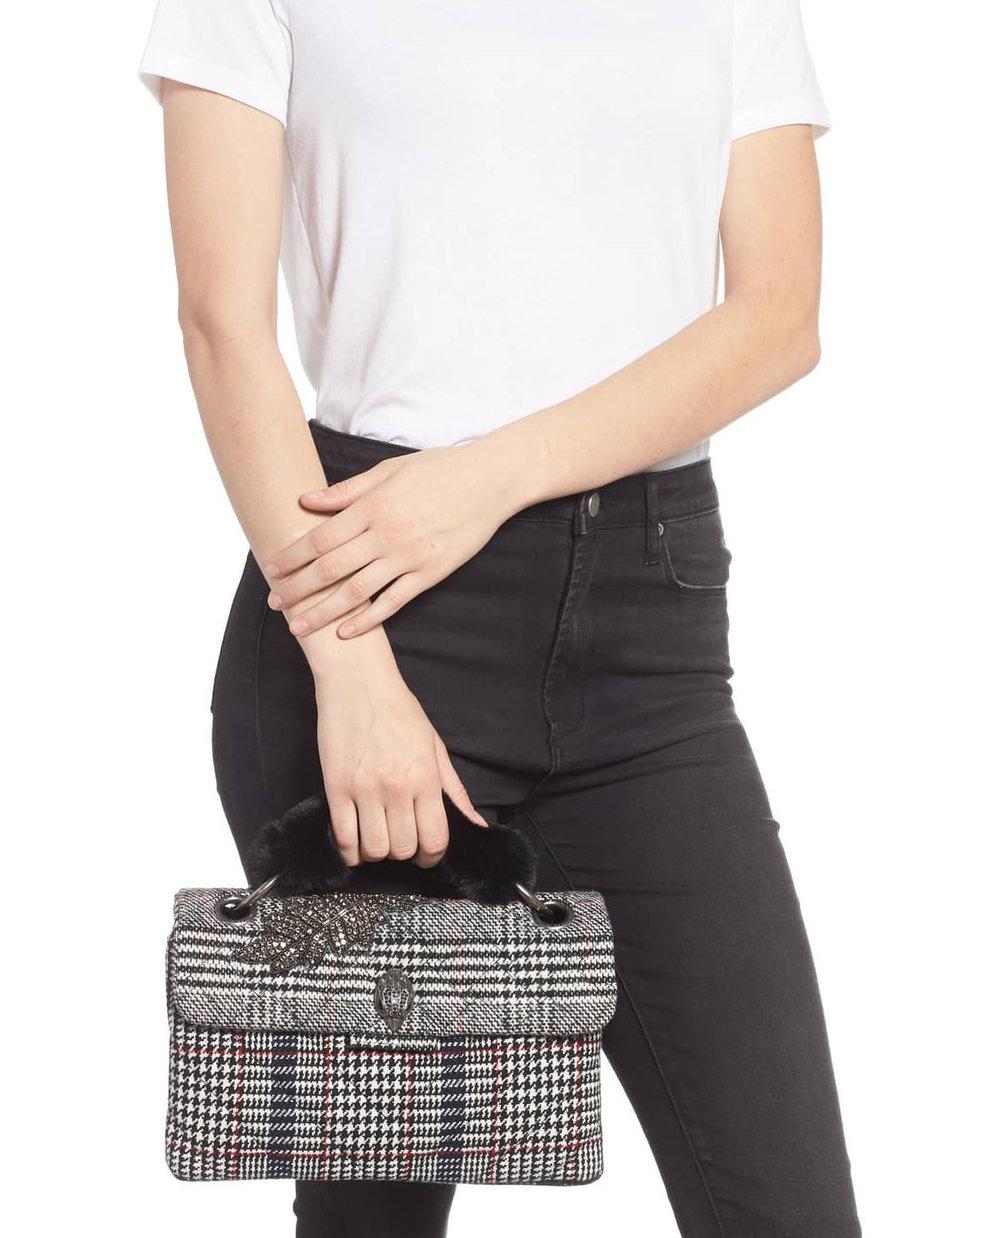 Kurt Geiger Plaid Bag   $138.60